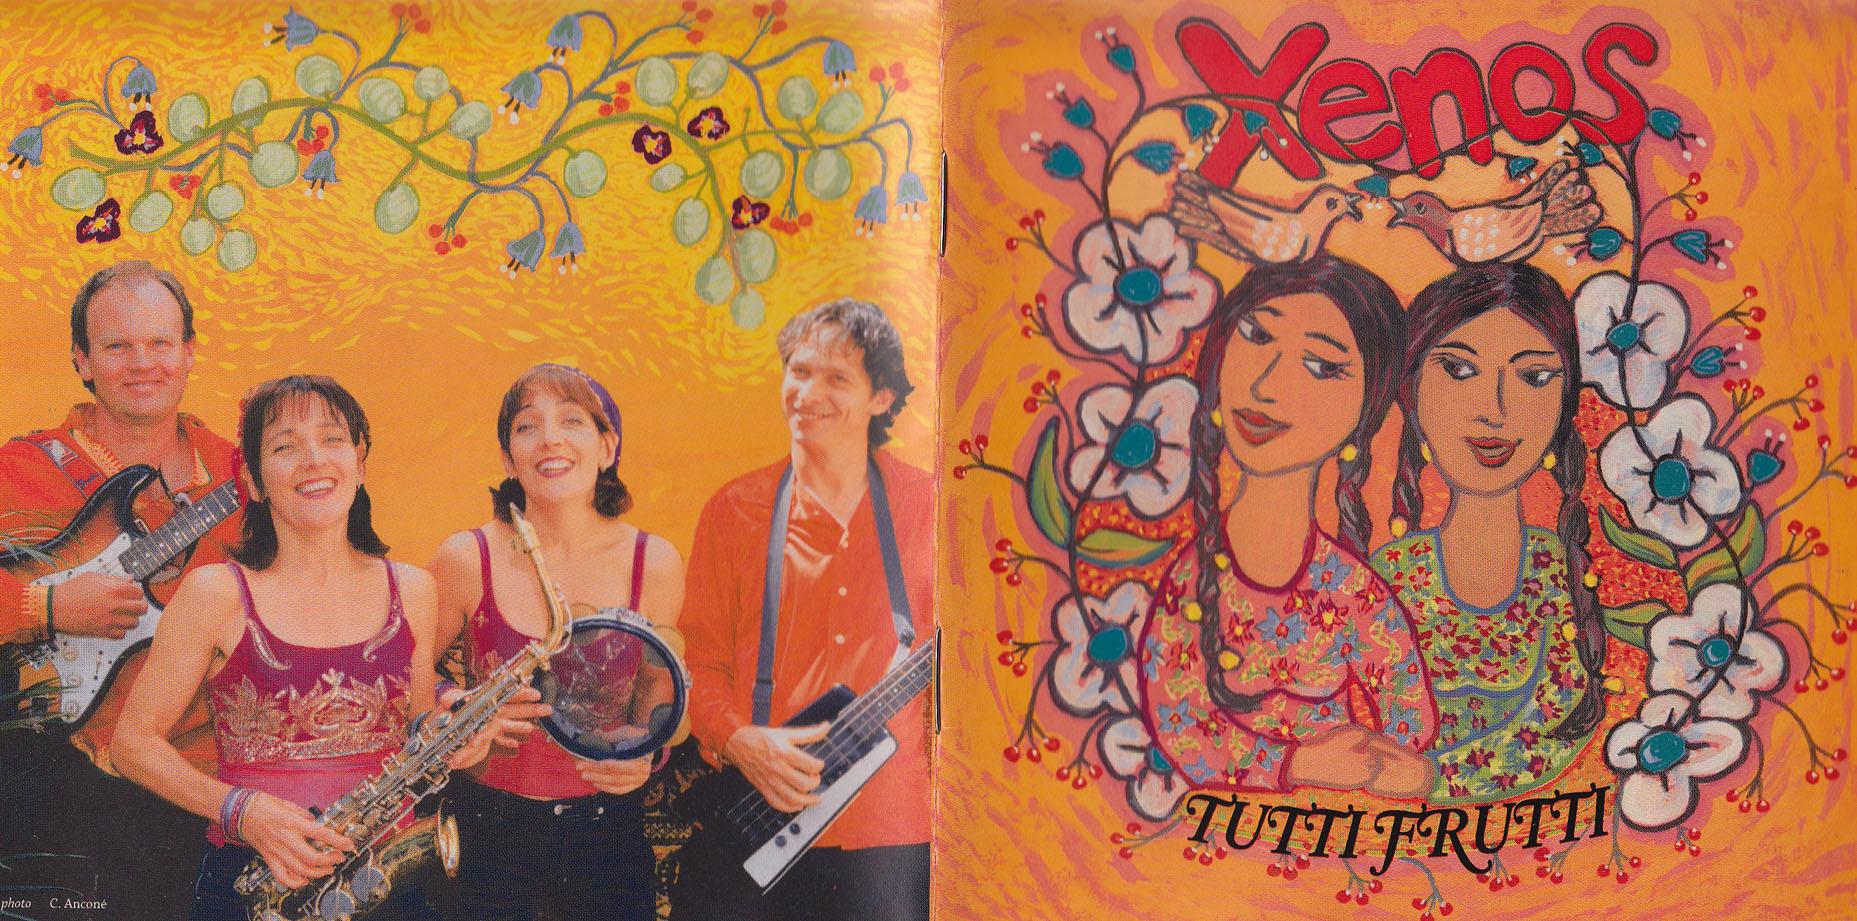 Xenos_CD_cover_Tutti_Frutti.jpg